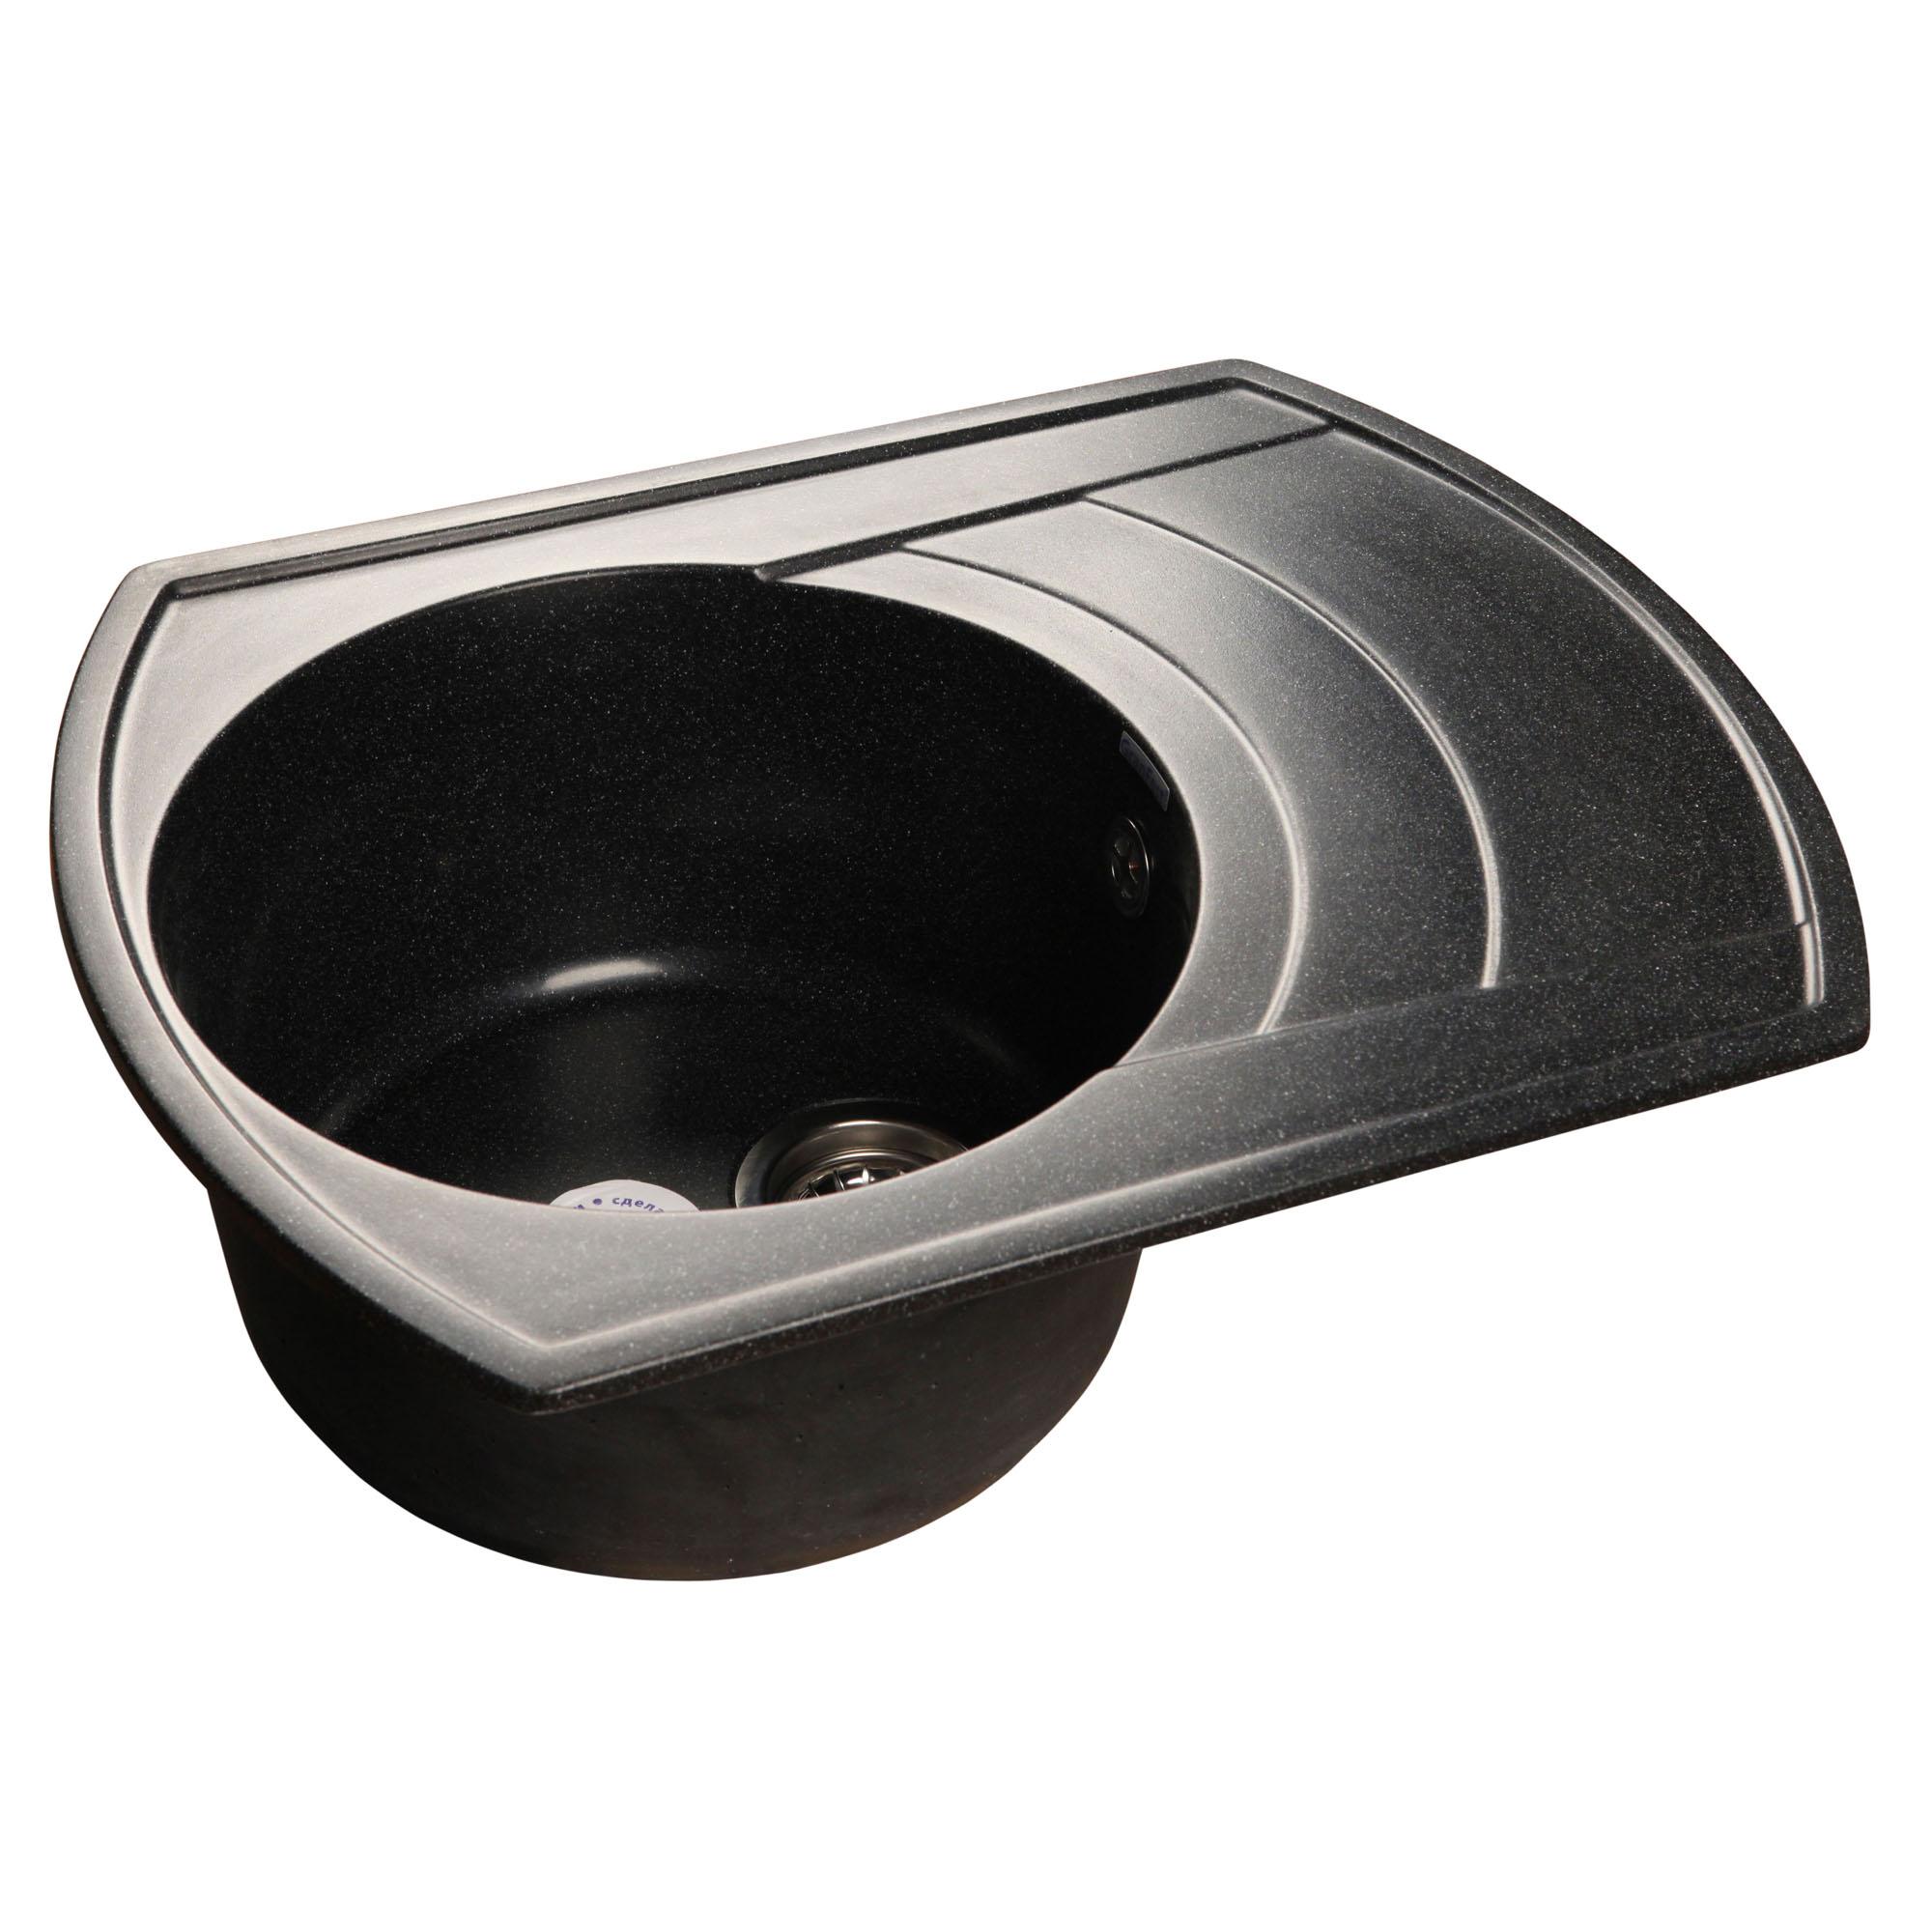 Кухонная мойка GranFest Rondo GF-R650L черный мойка кухонная granfest гранит 650x500 чаша крыло gf r650l черная